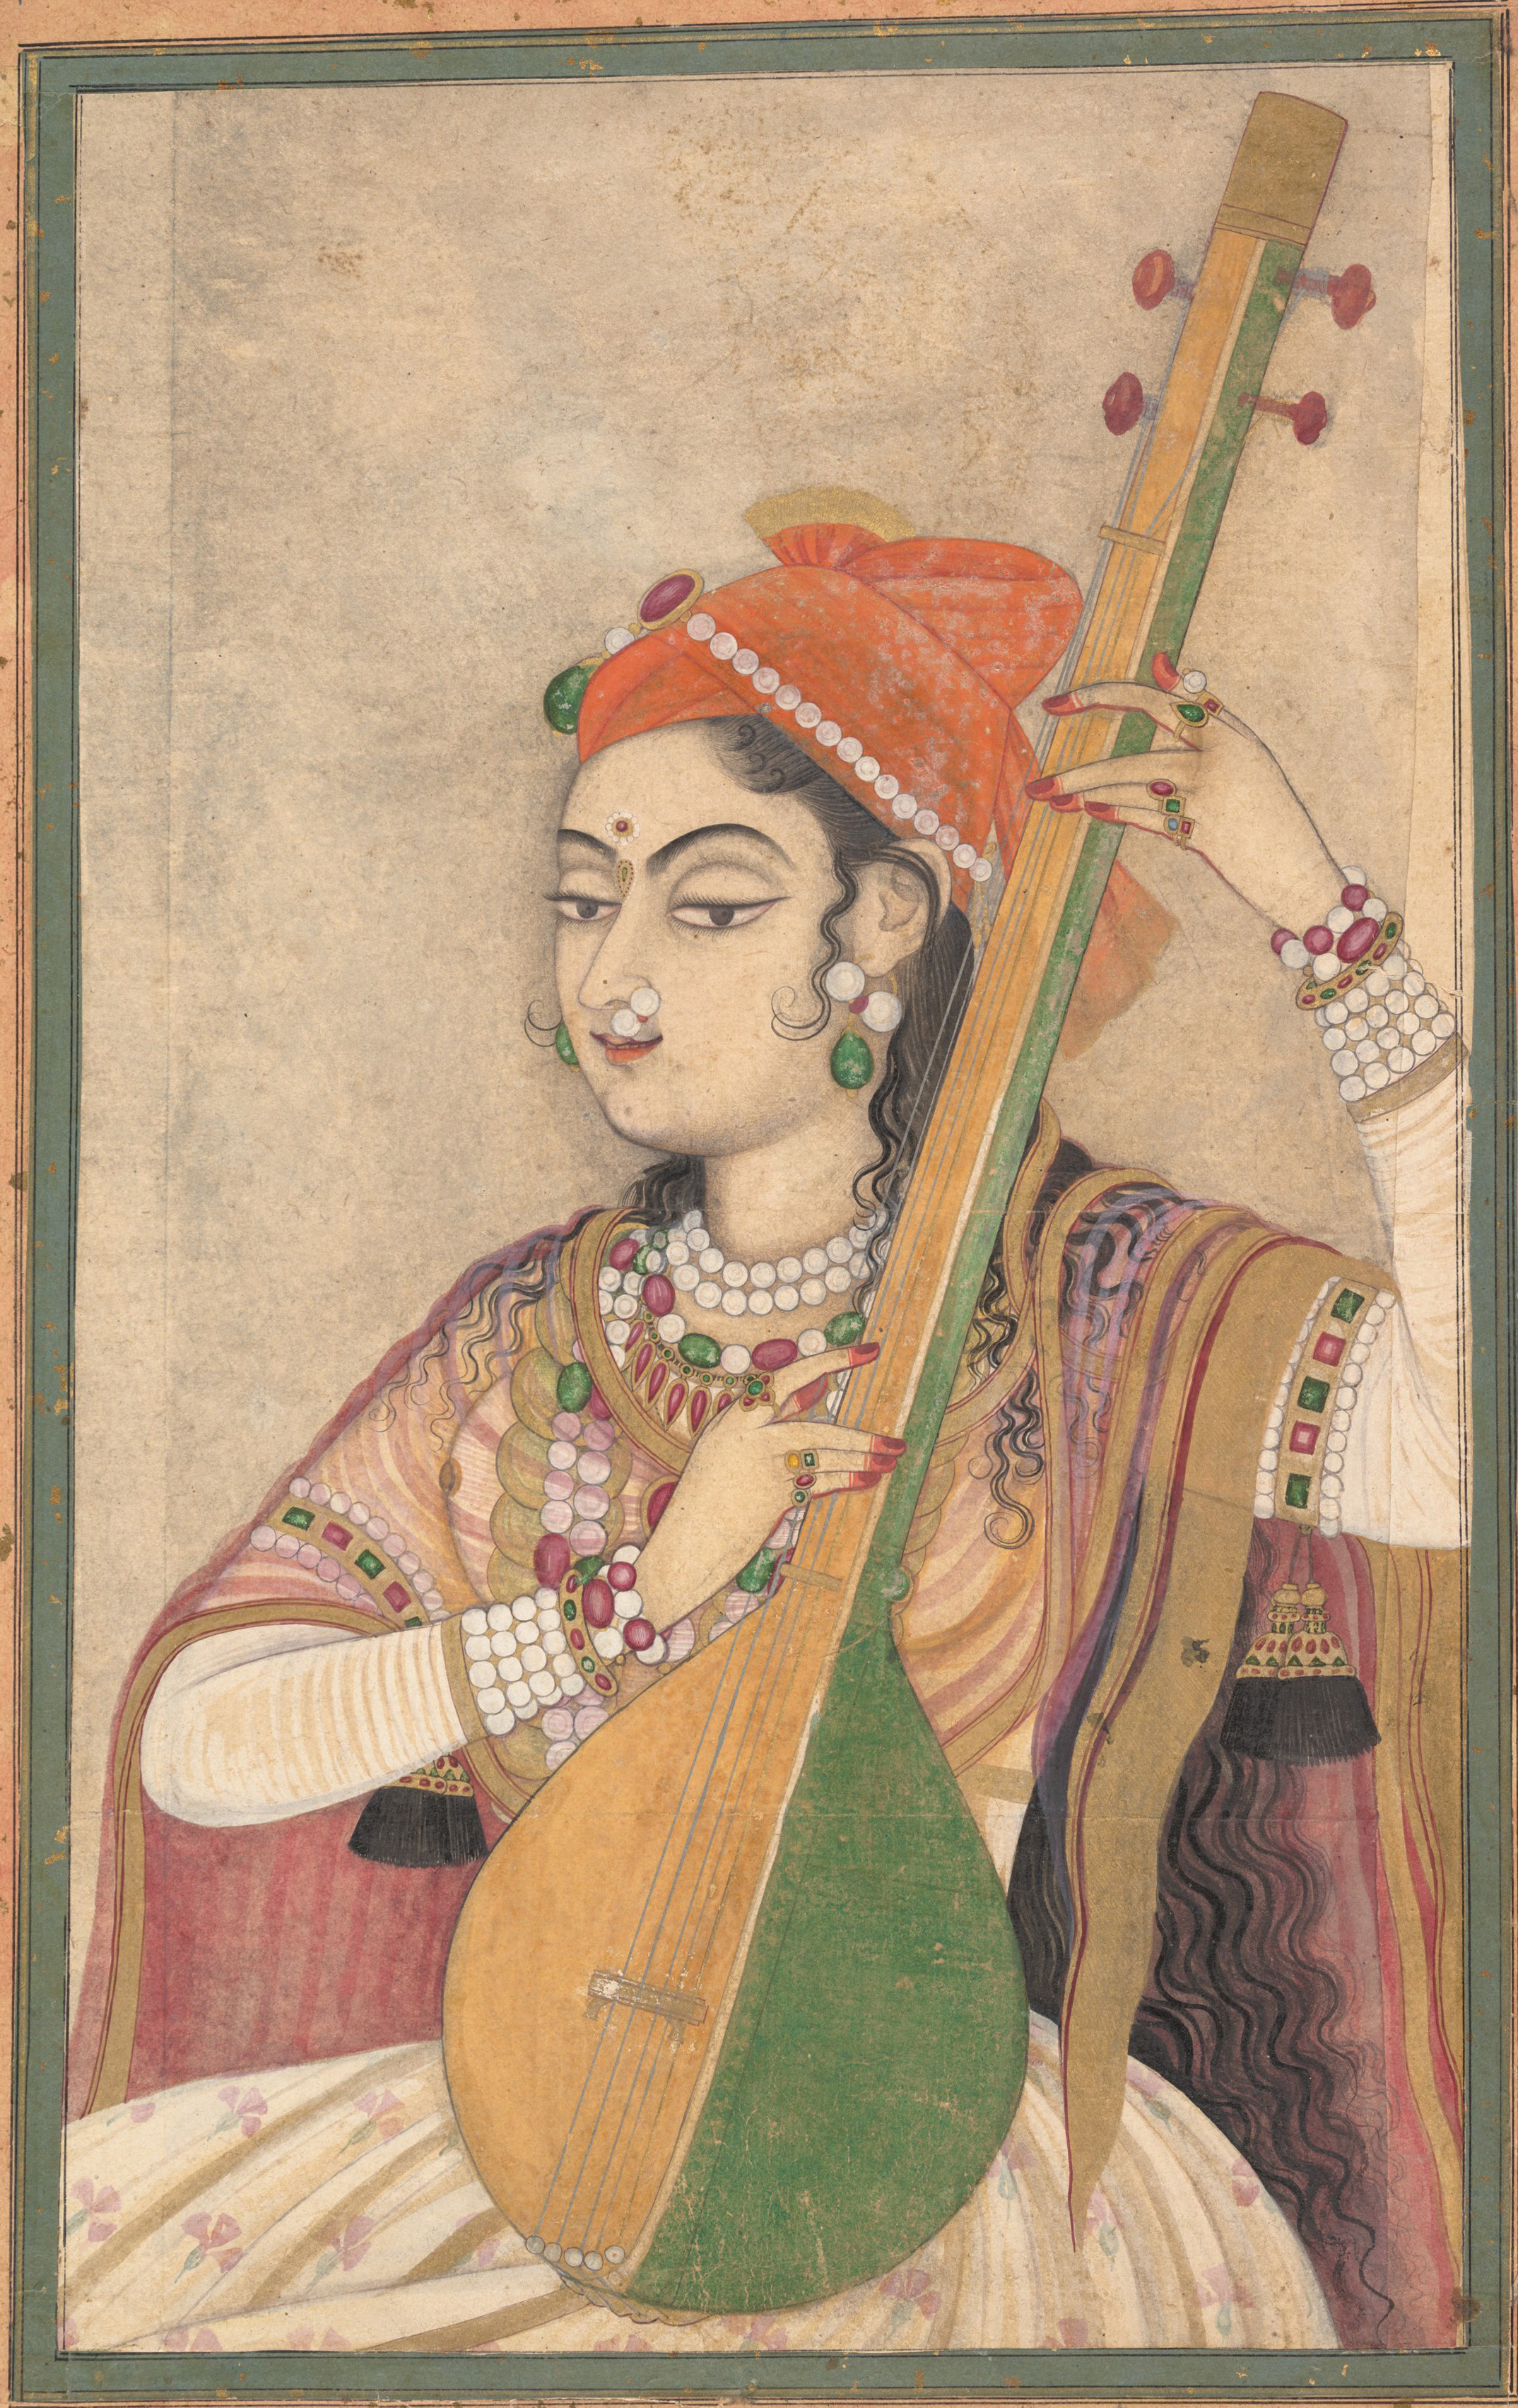 http://upload.wikimedia.org/wikipedia/commons/1/13/A_Lady_Playing_the_Tanpura,_ca._1735.jpg